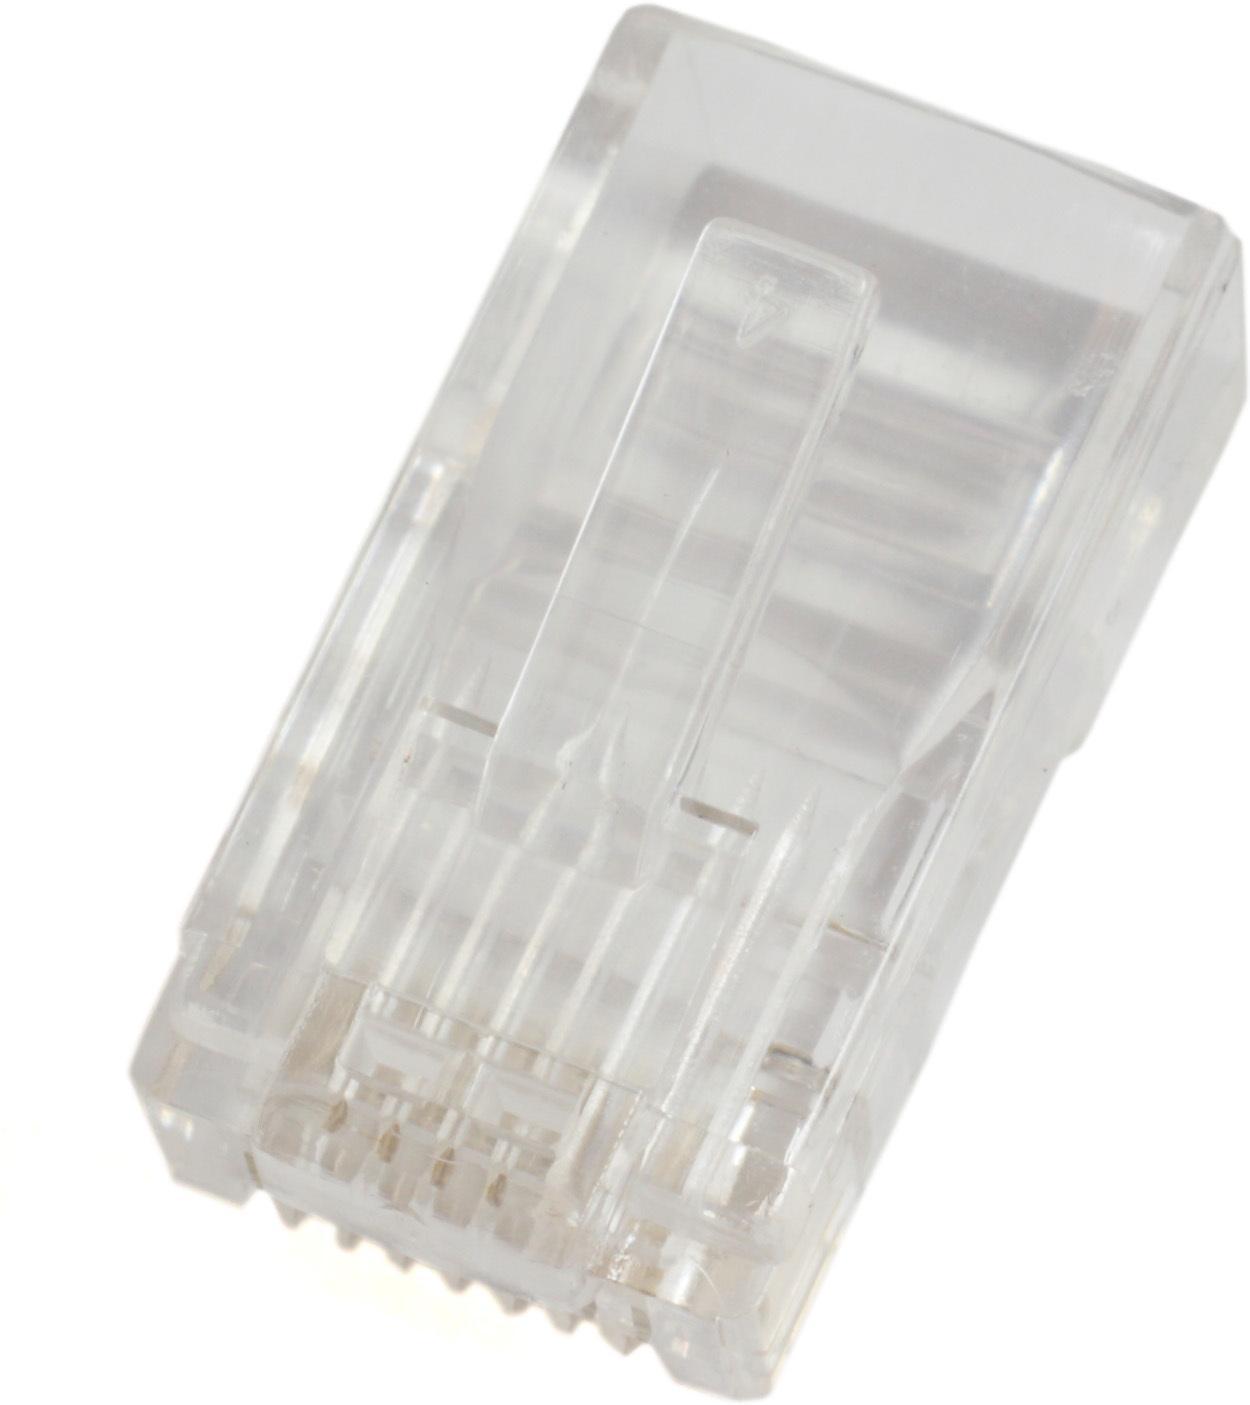 Microconnect KON503-10 wire connector RJ45